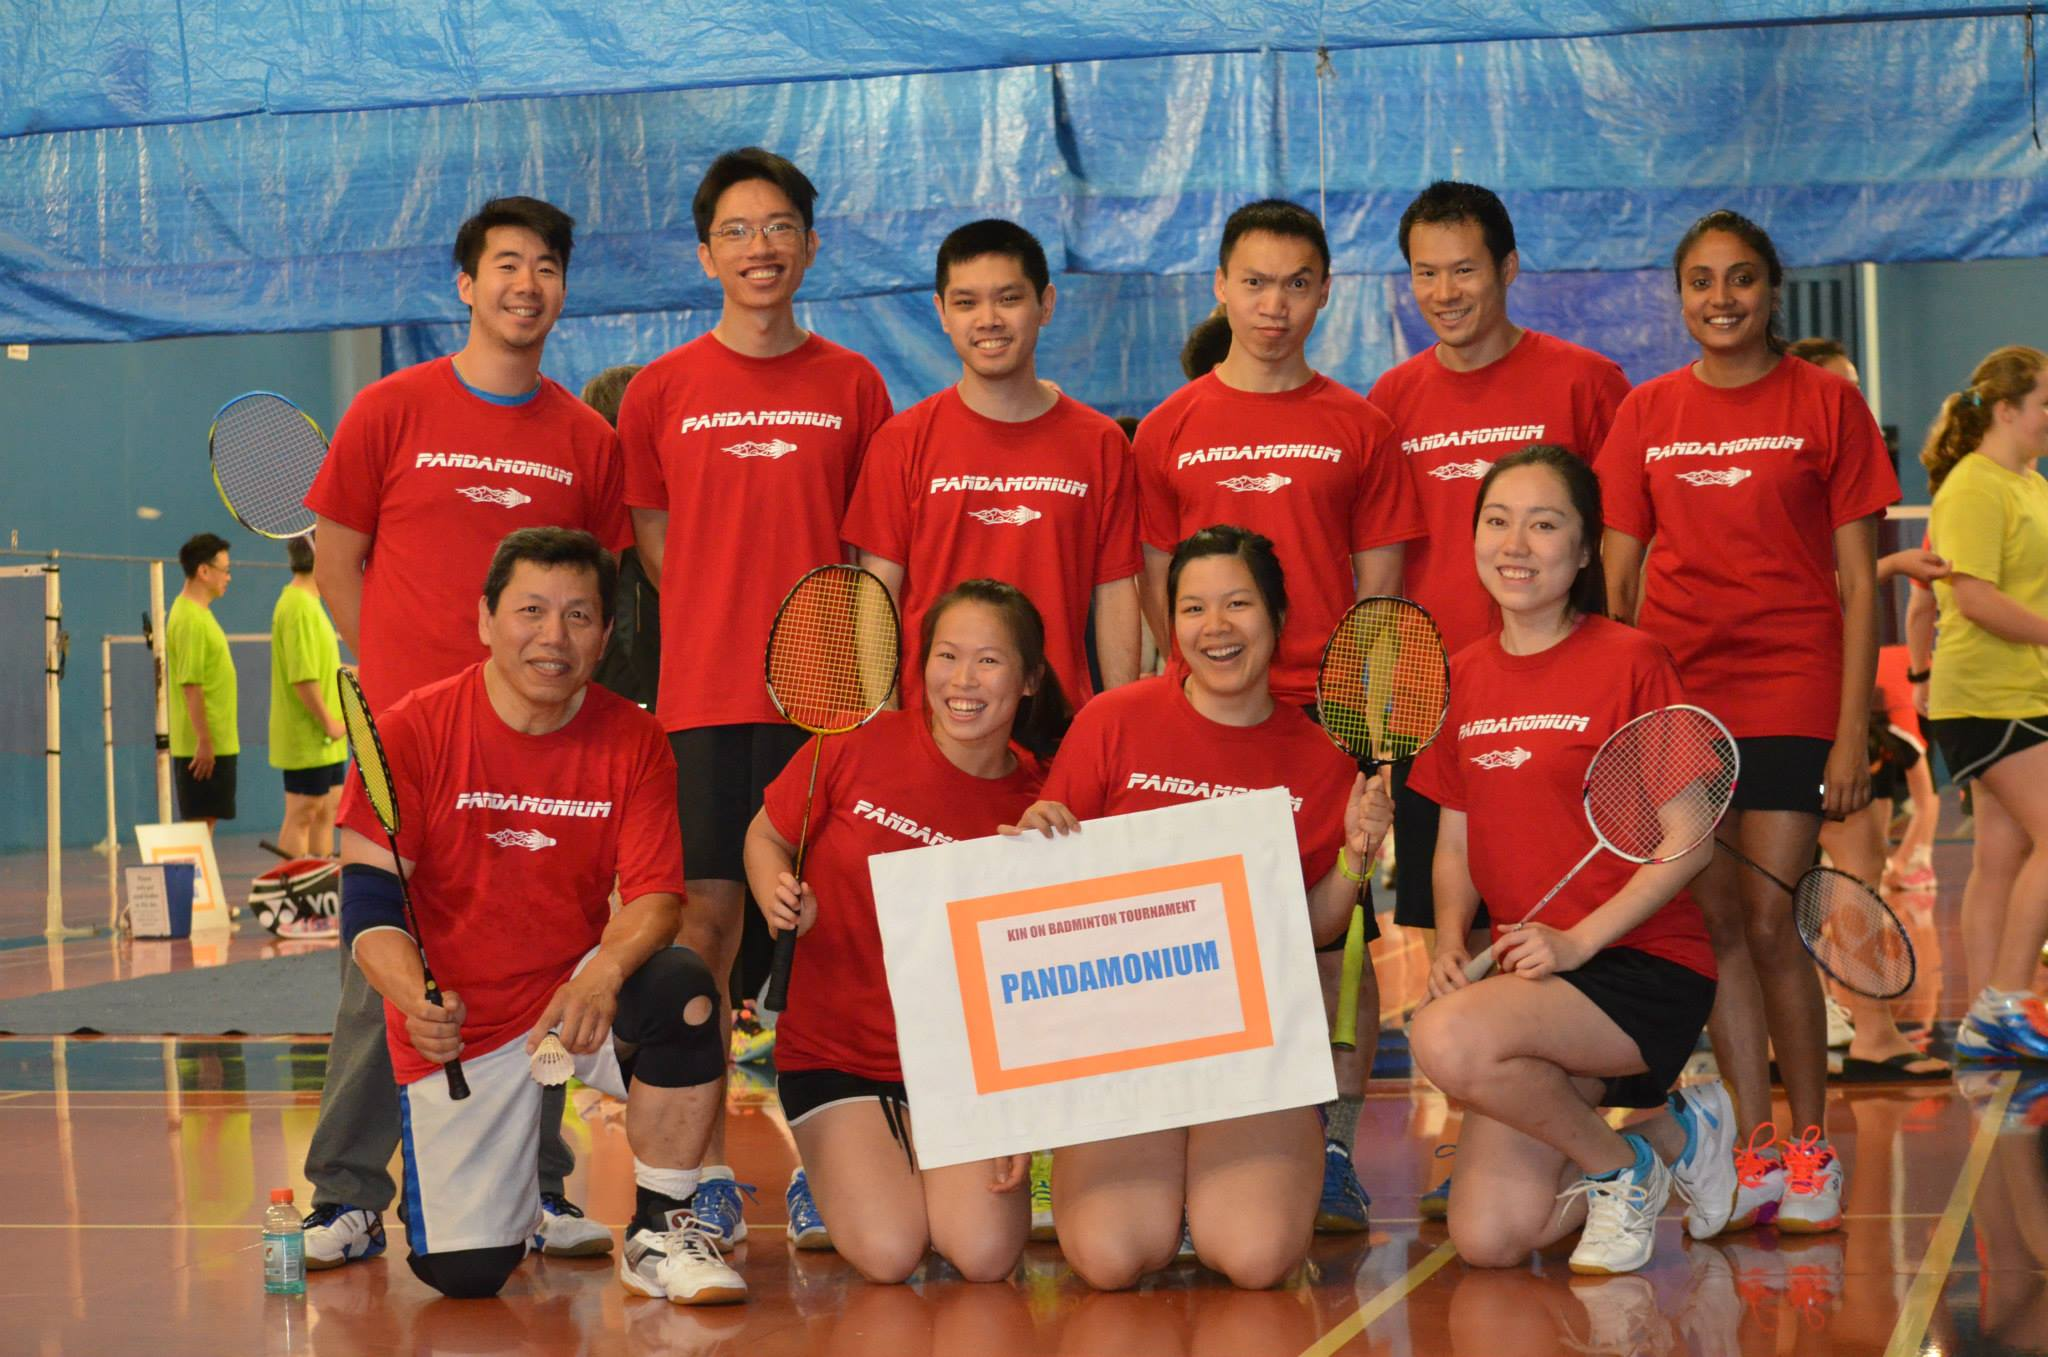 2a563481 Pandamonium Won 2nd Place In A Local Fundraiser Badminton Tournament! T- Shirt Photo